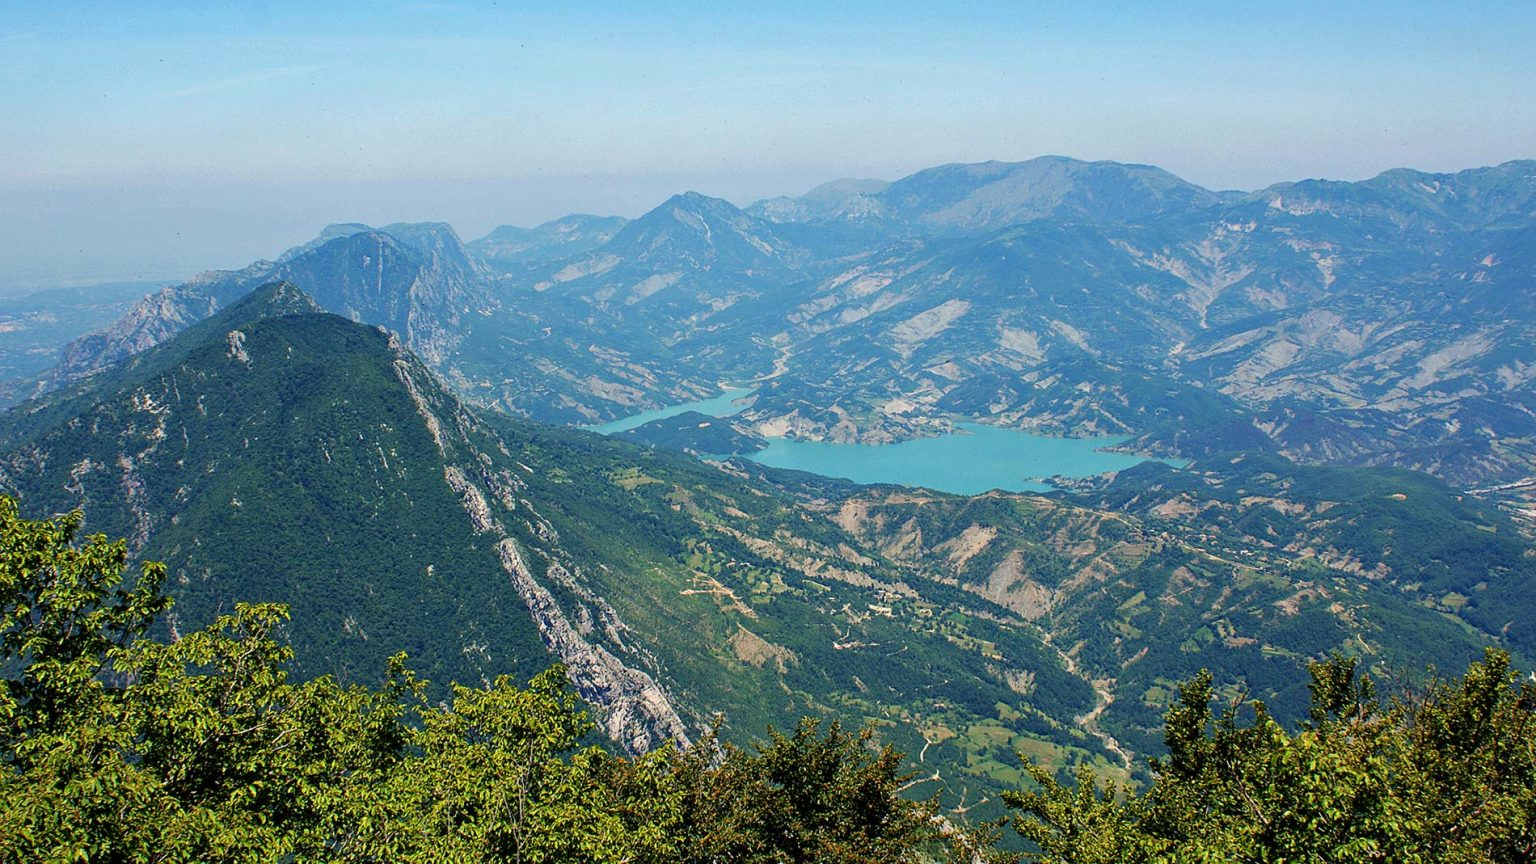 Dajti Mountain, Tirana, Source: boomsbeat.com